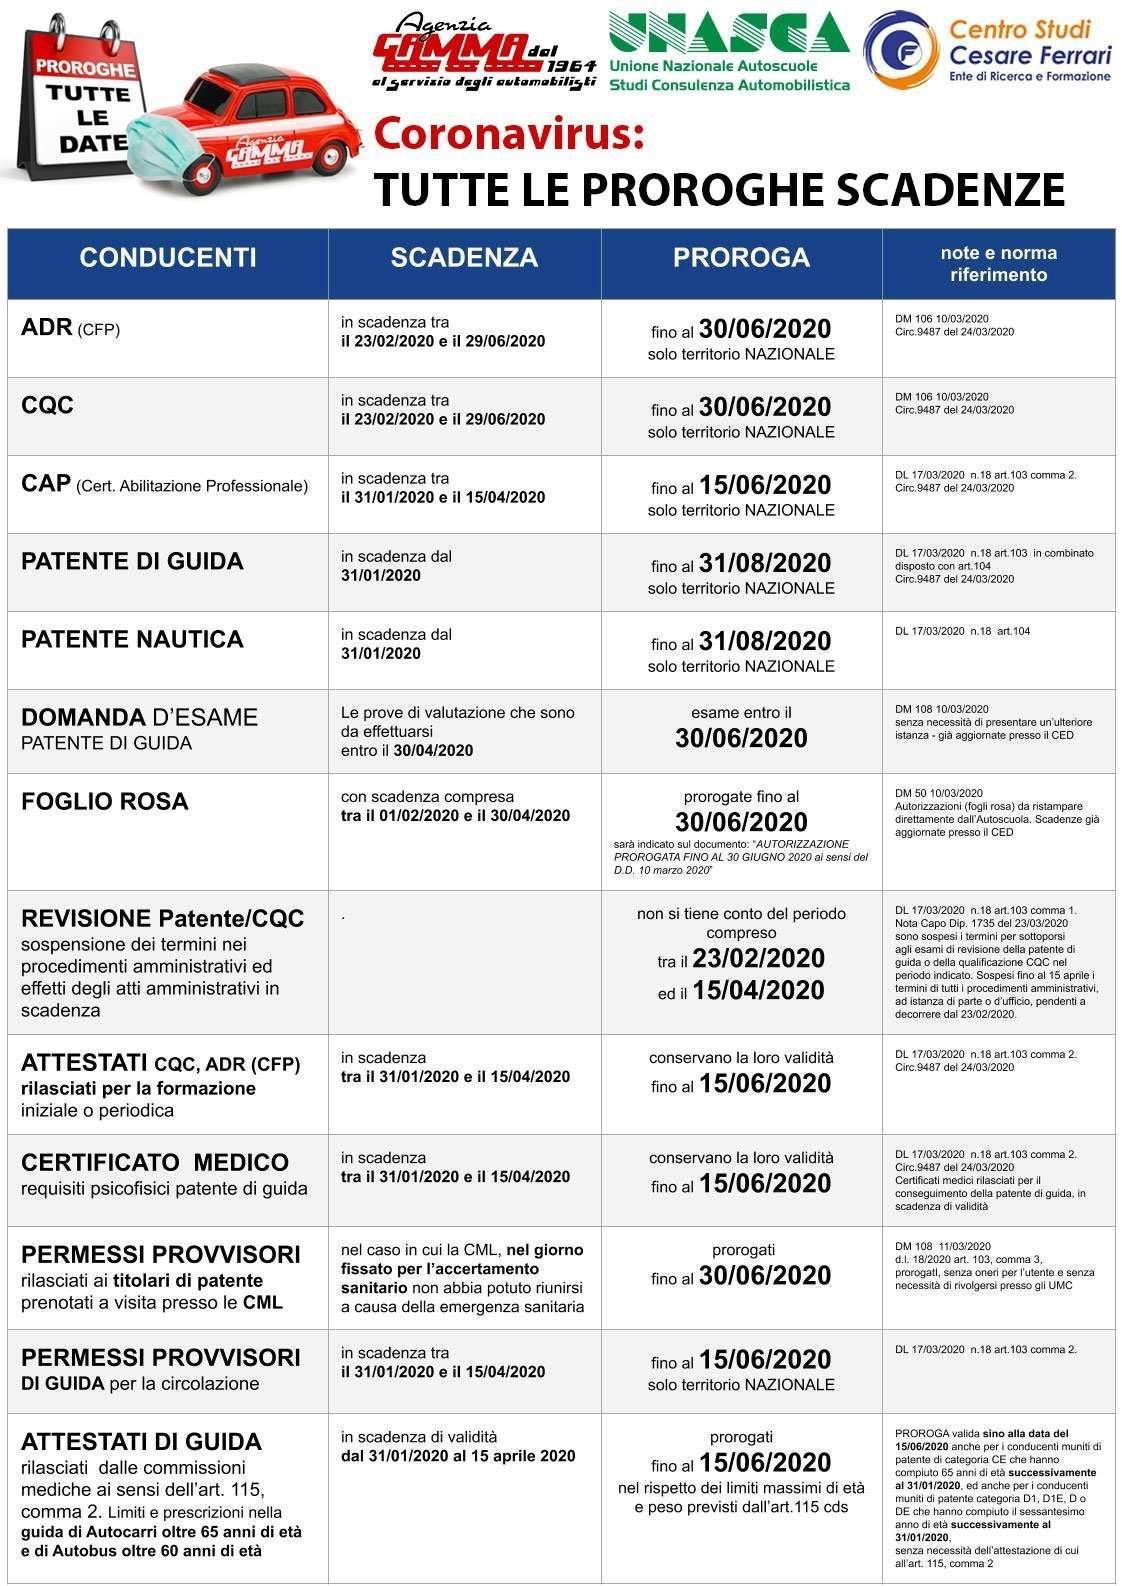 Coronavirus: Riepilogo proroghe scadenze